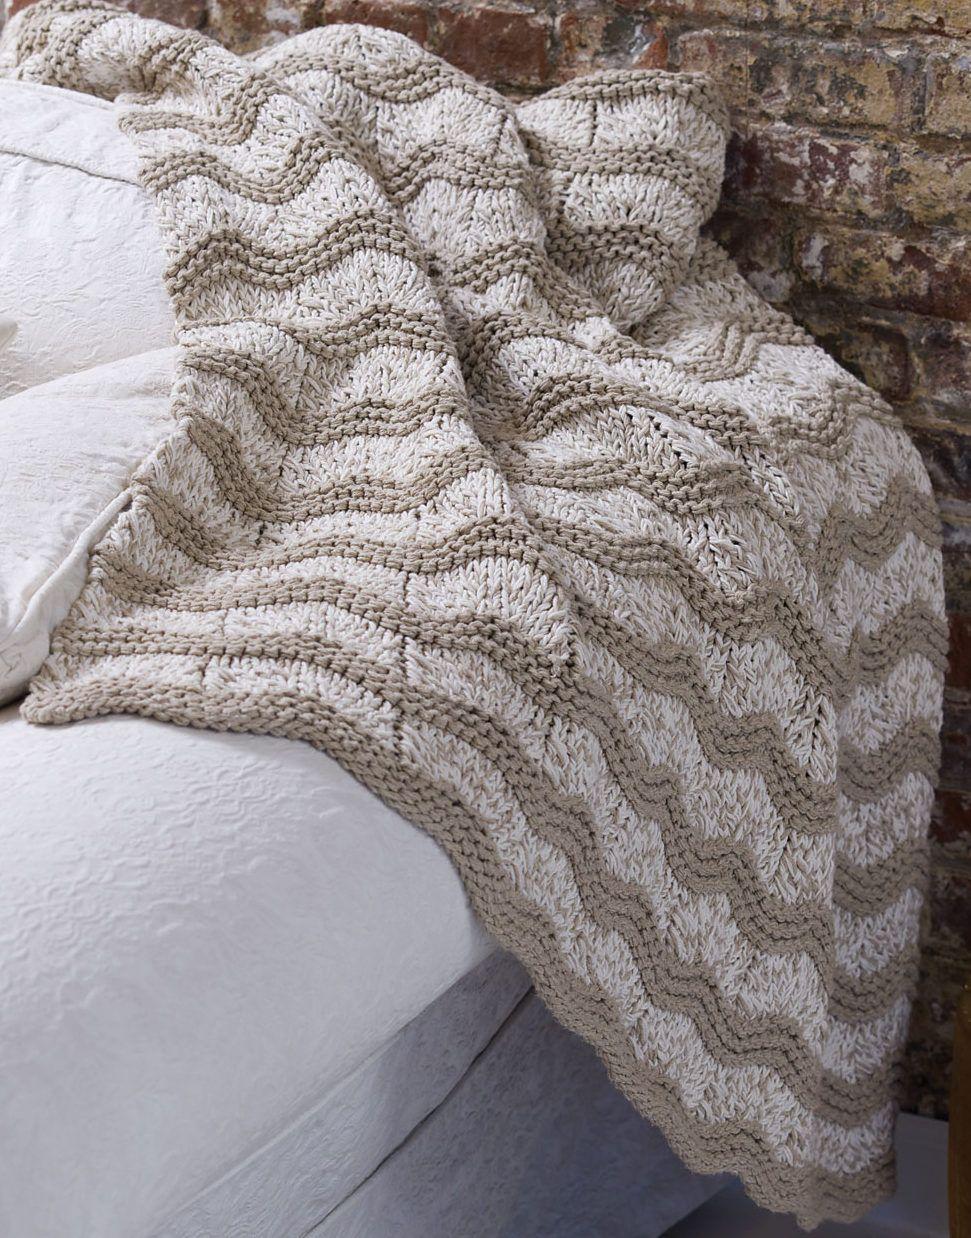 Easy afghan knitting patterns afghans knitting patterns and yarns easy afghan knitting patterns bankloansurffo Images